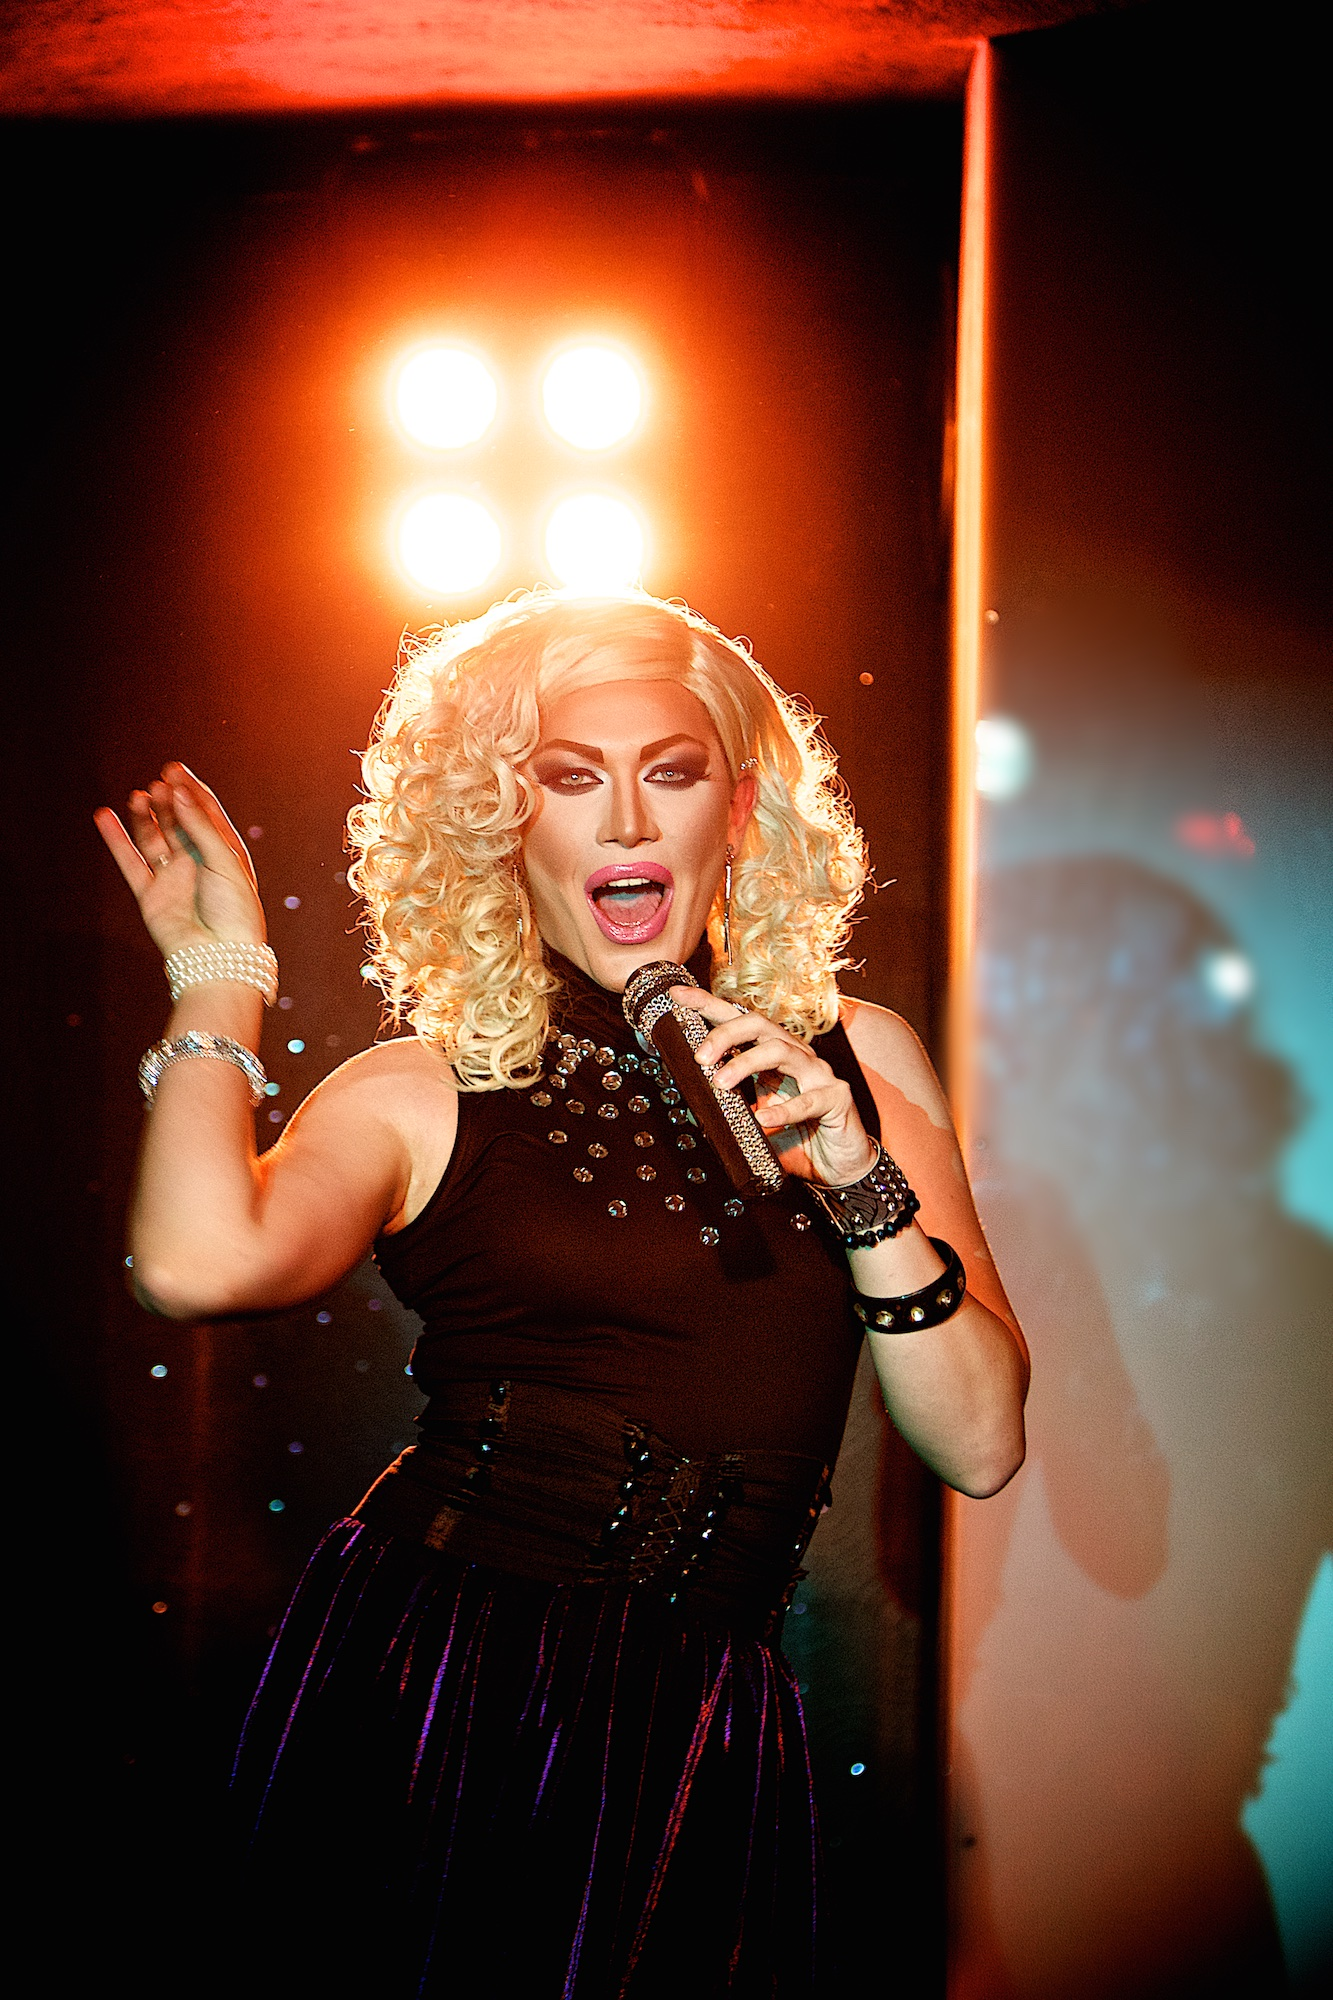 Danny-Elle Performing (Aleter Ego, Budapest)